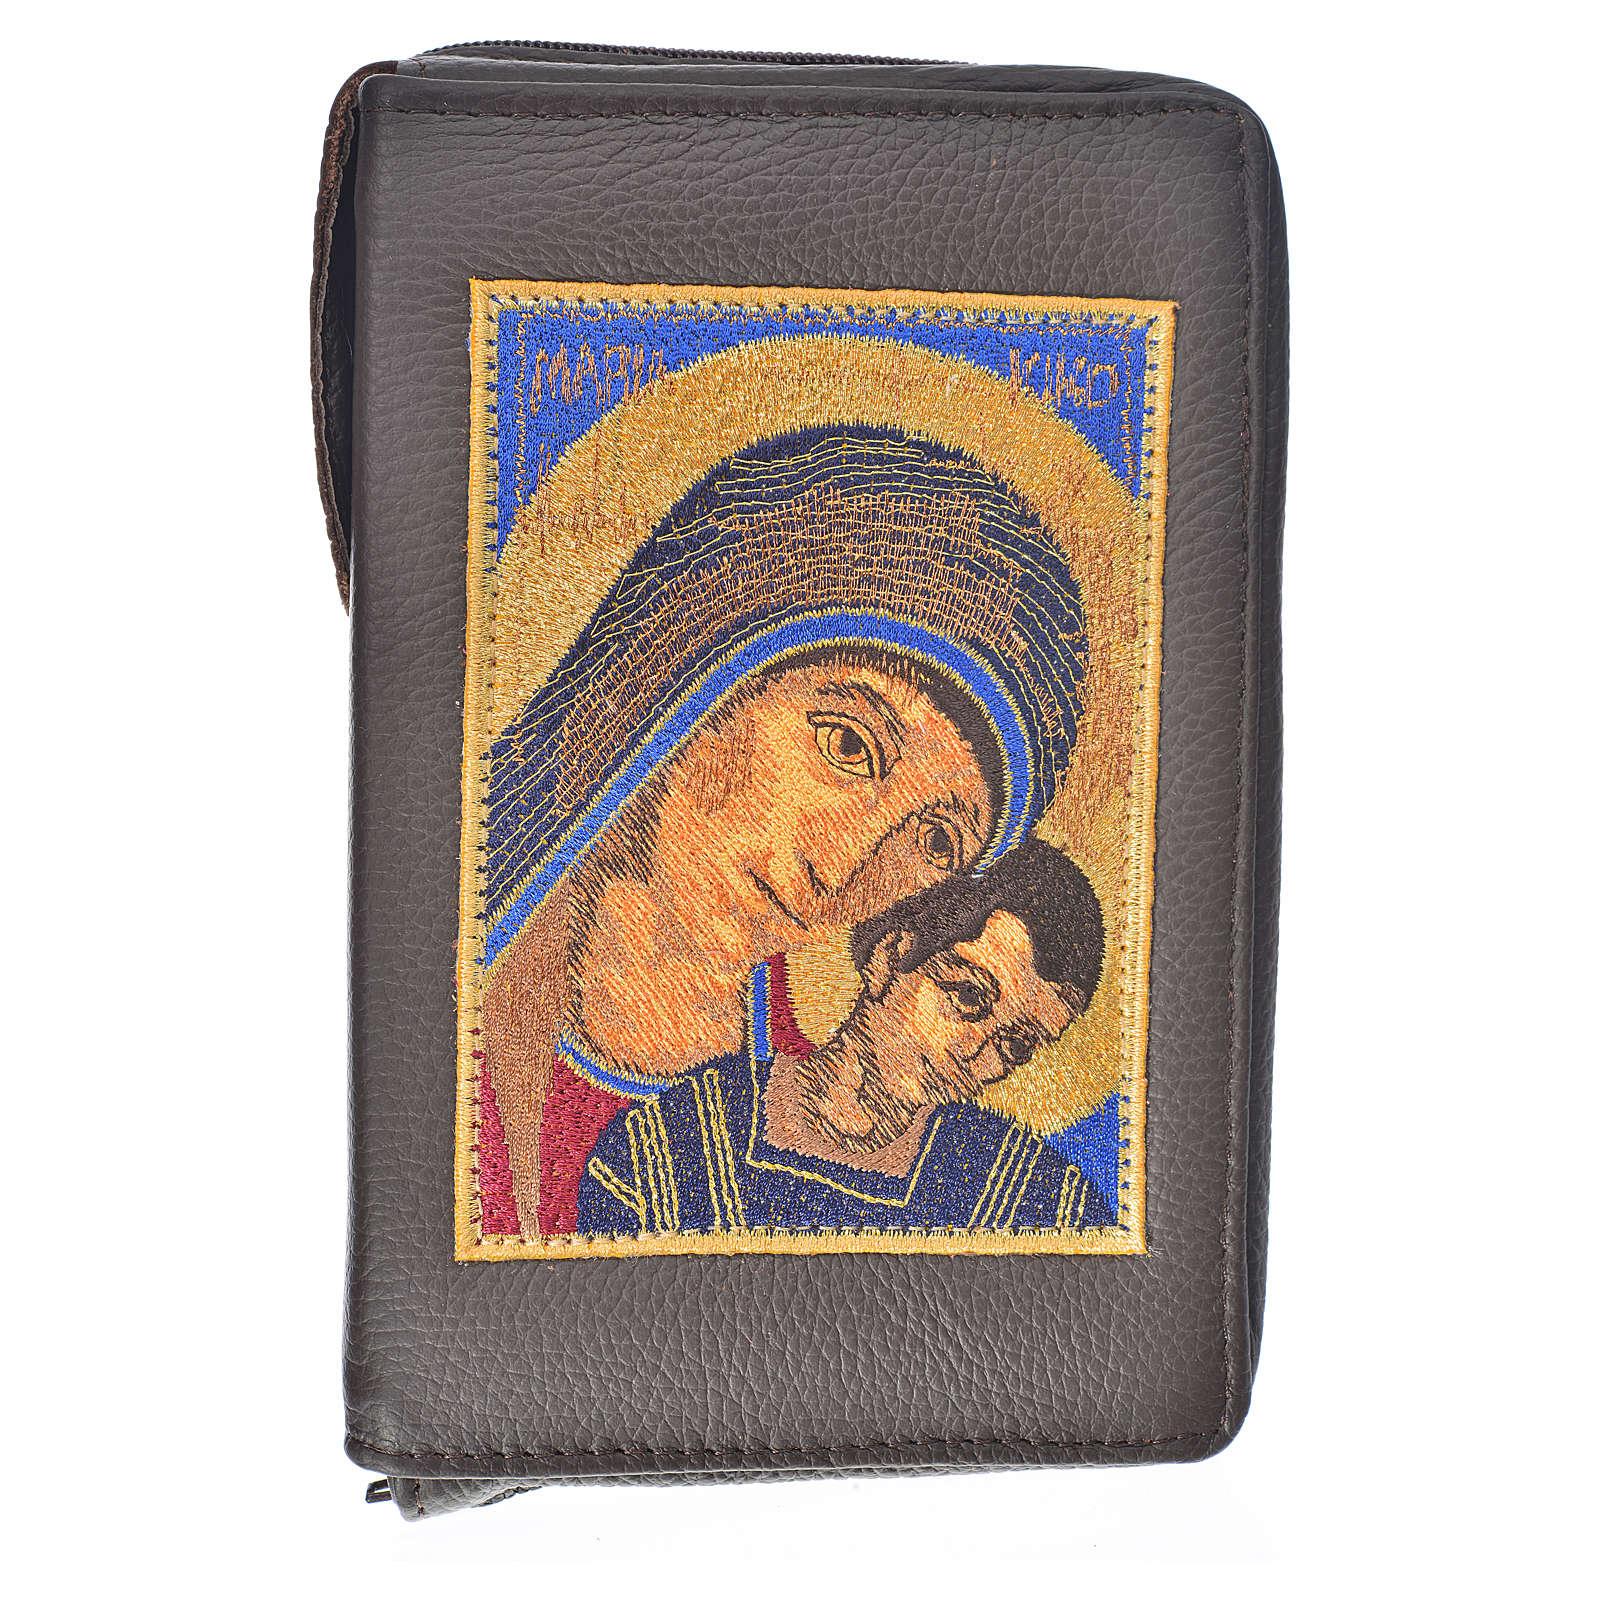 Funda Sagrada Biblia CEE ED. Pop. marrón oscuro piel Virgen Kiko 4